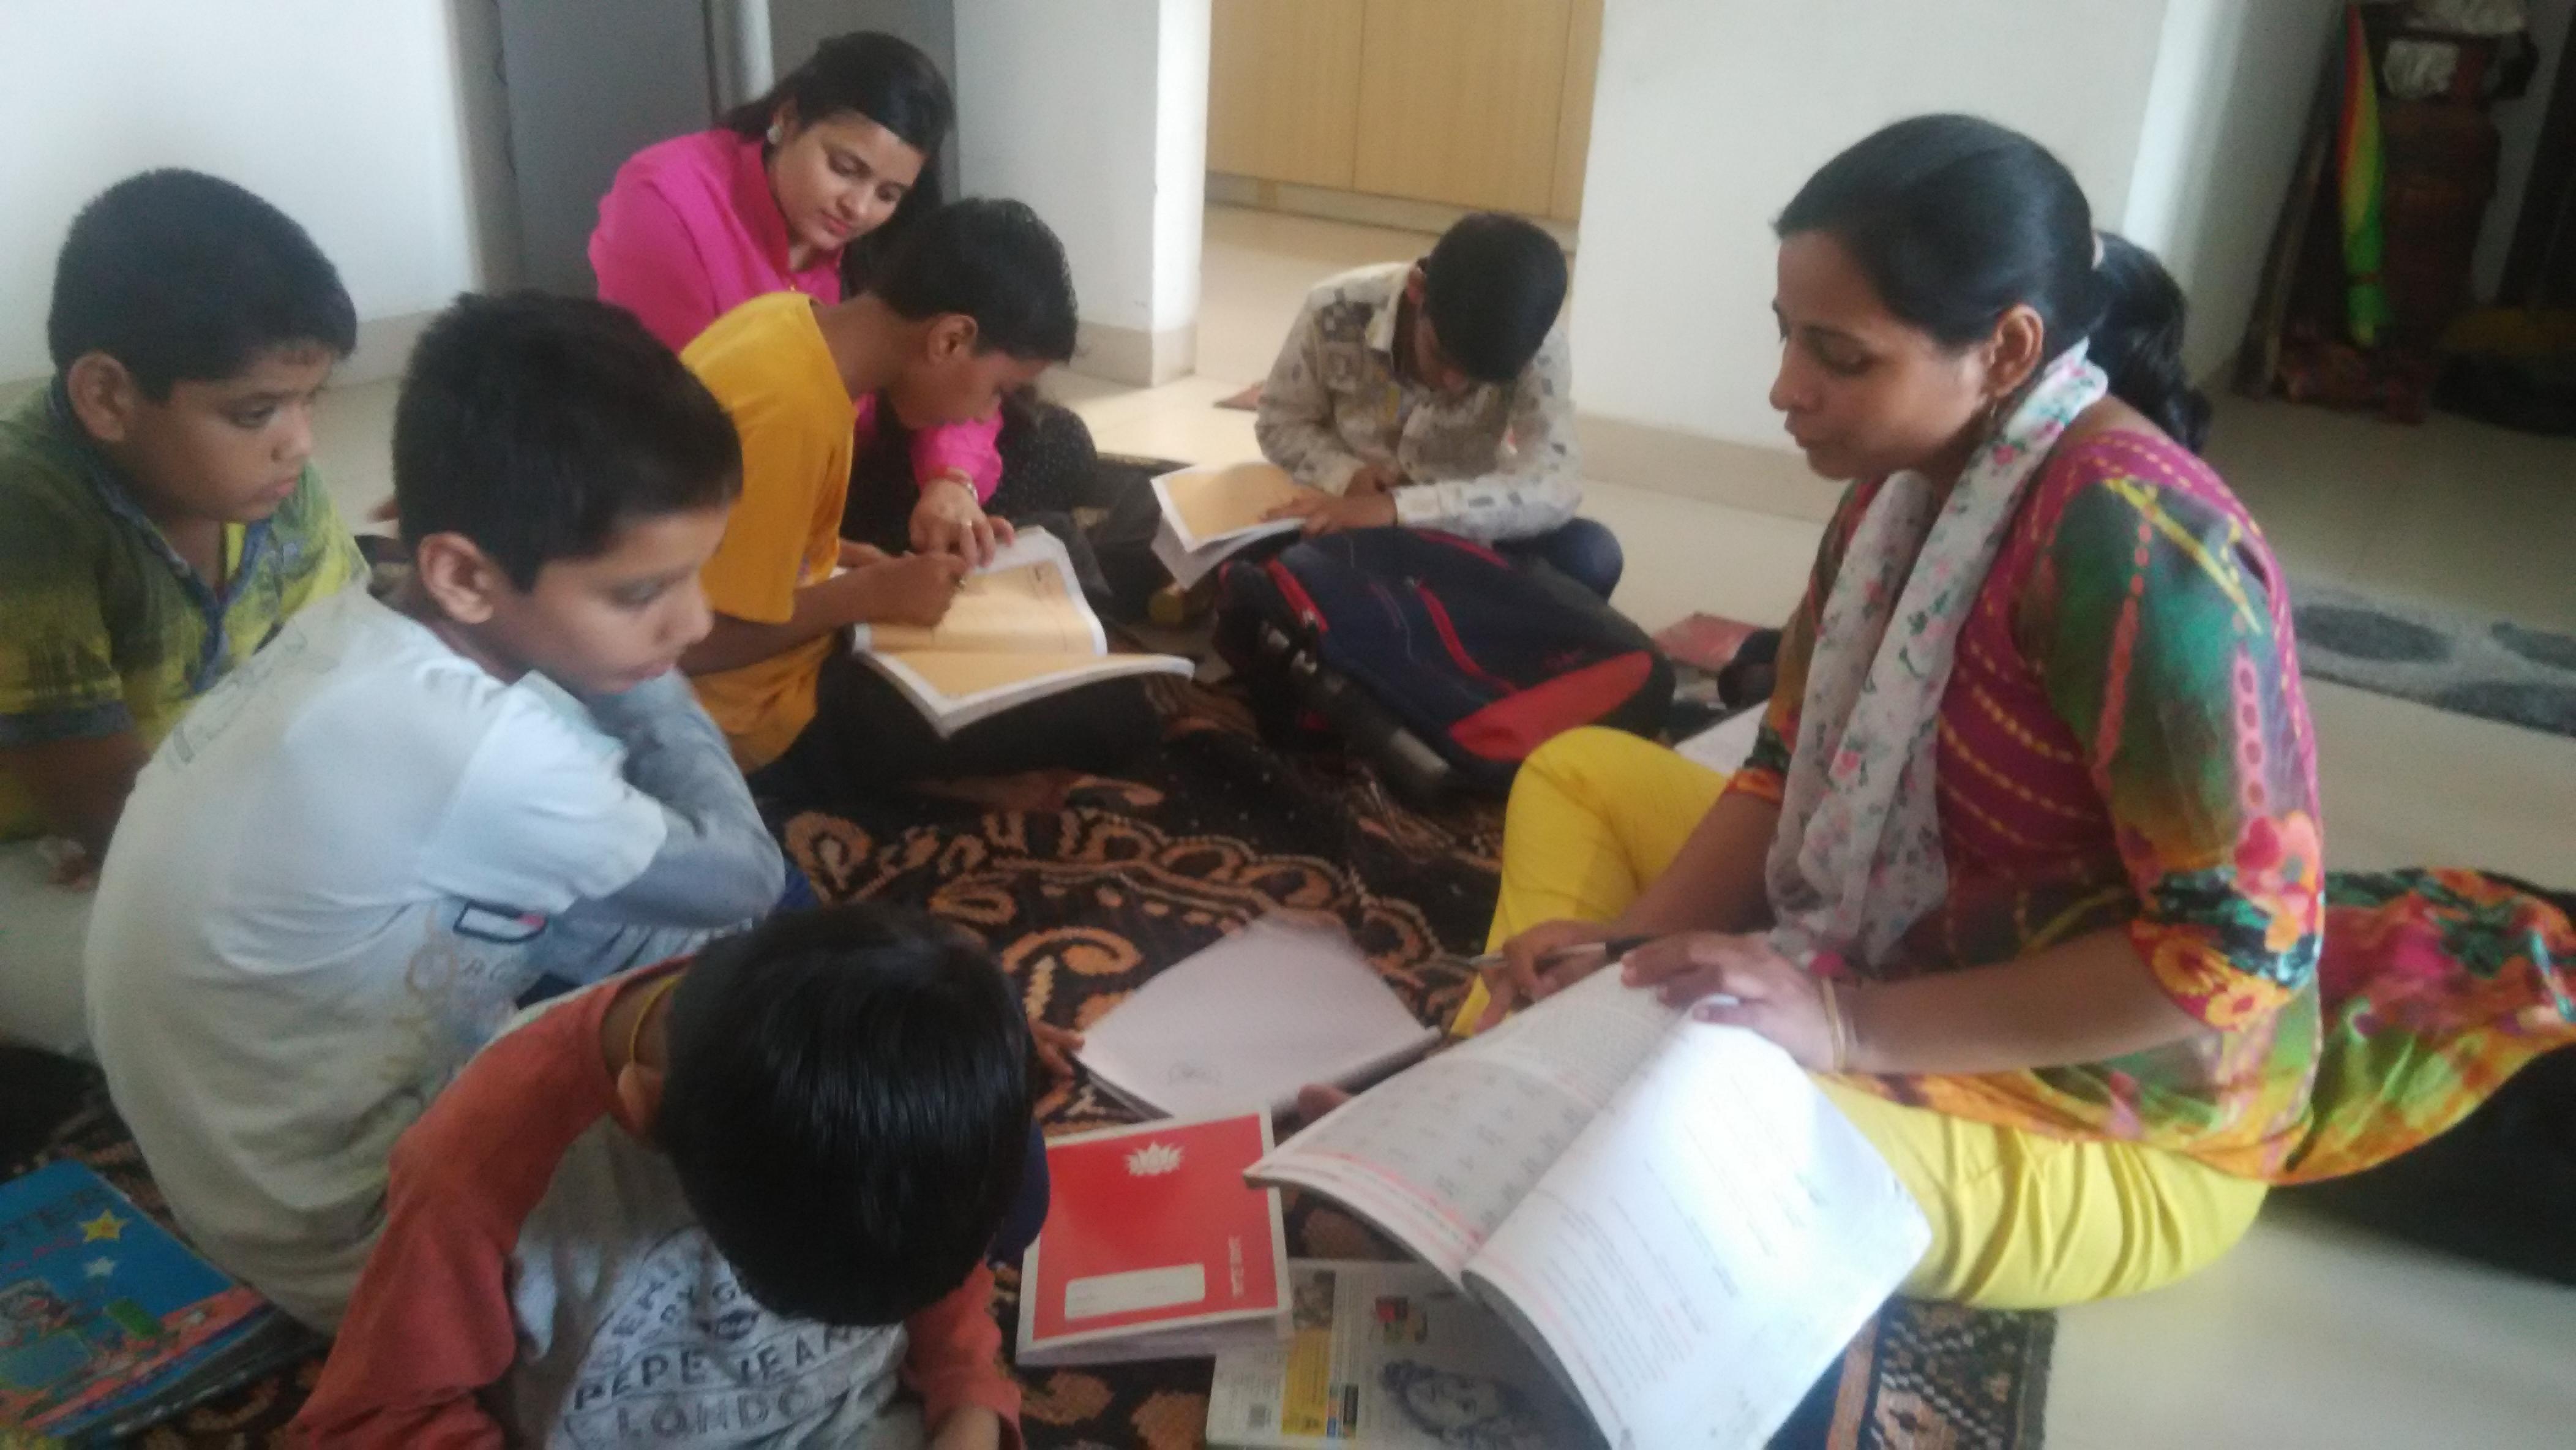 Craft Classes in Gurgaon, Craft Courses in Gurgaon | Sulekha